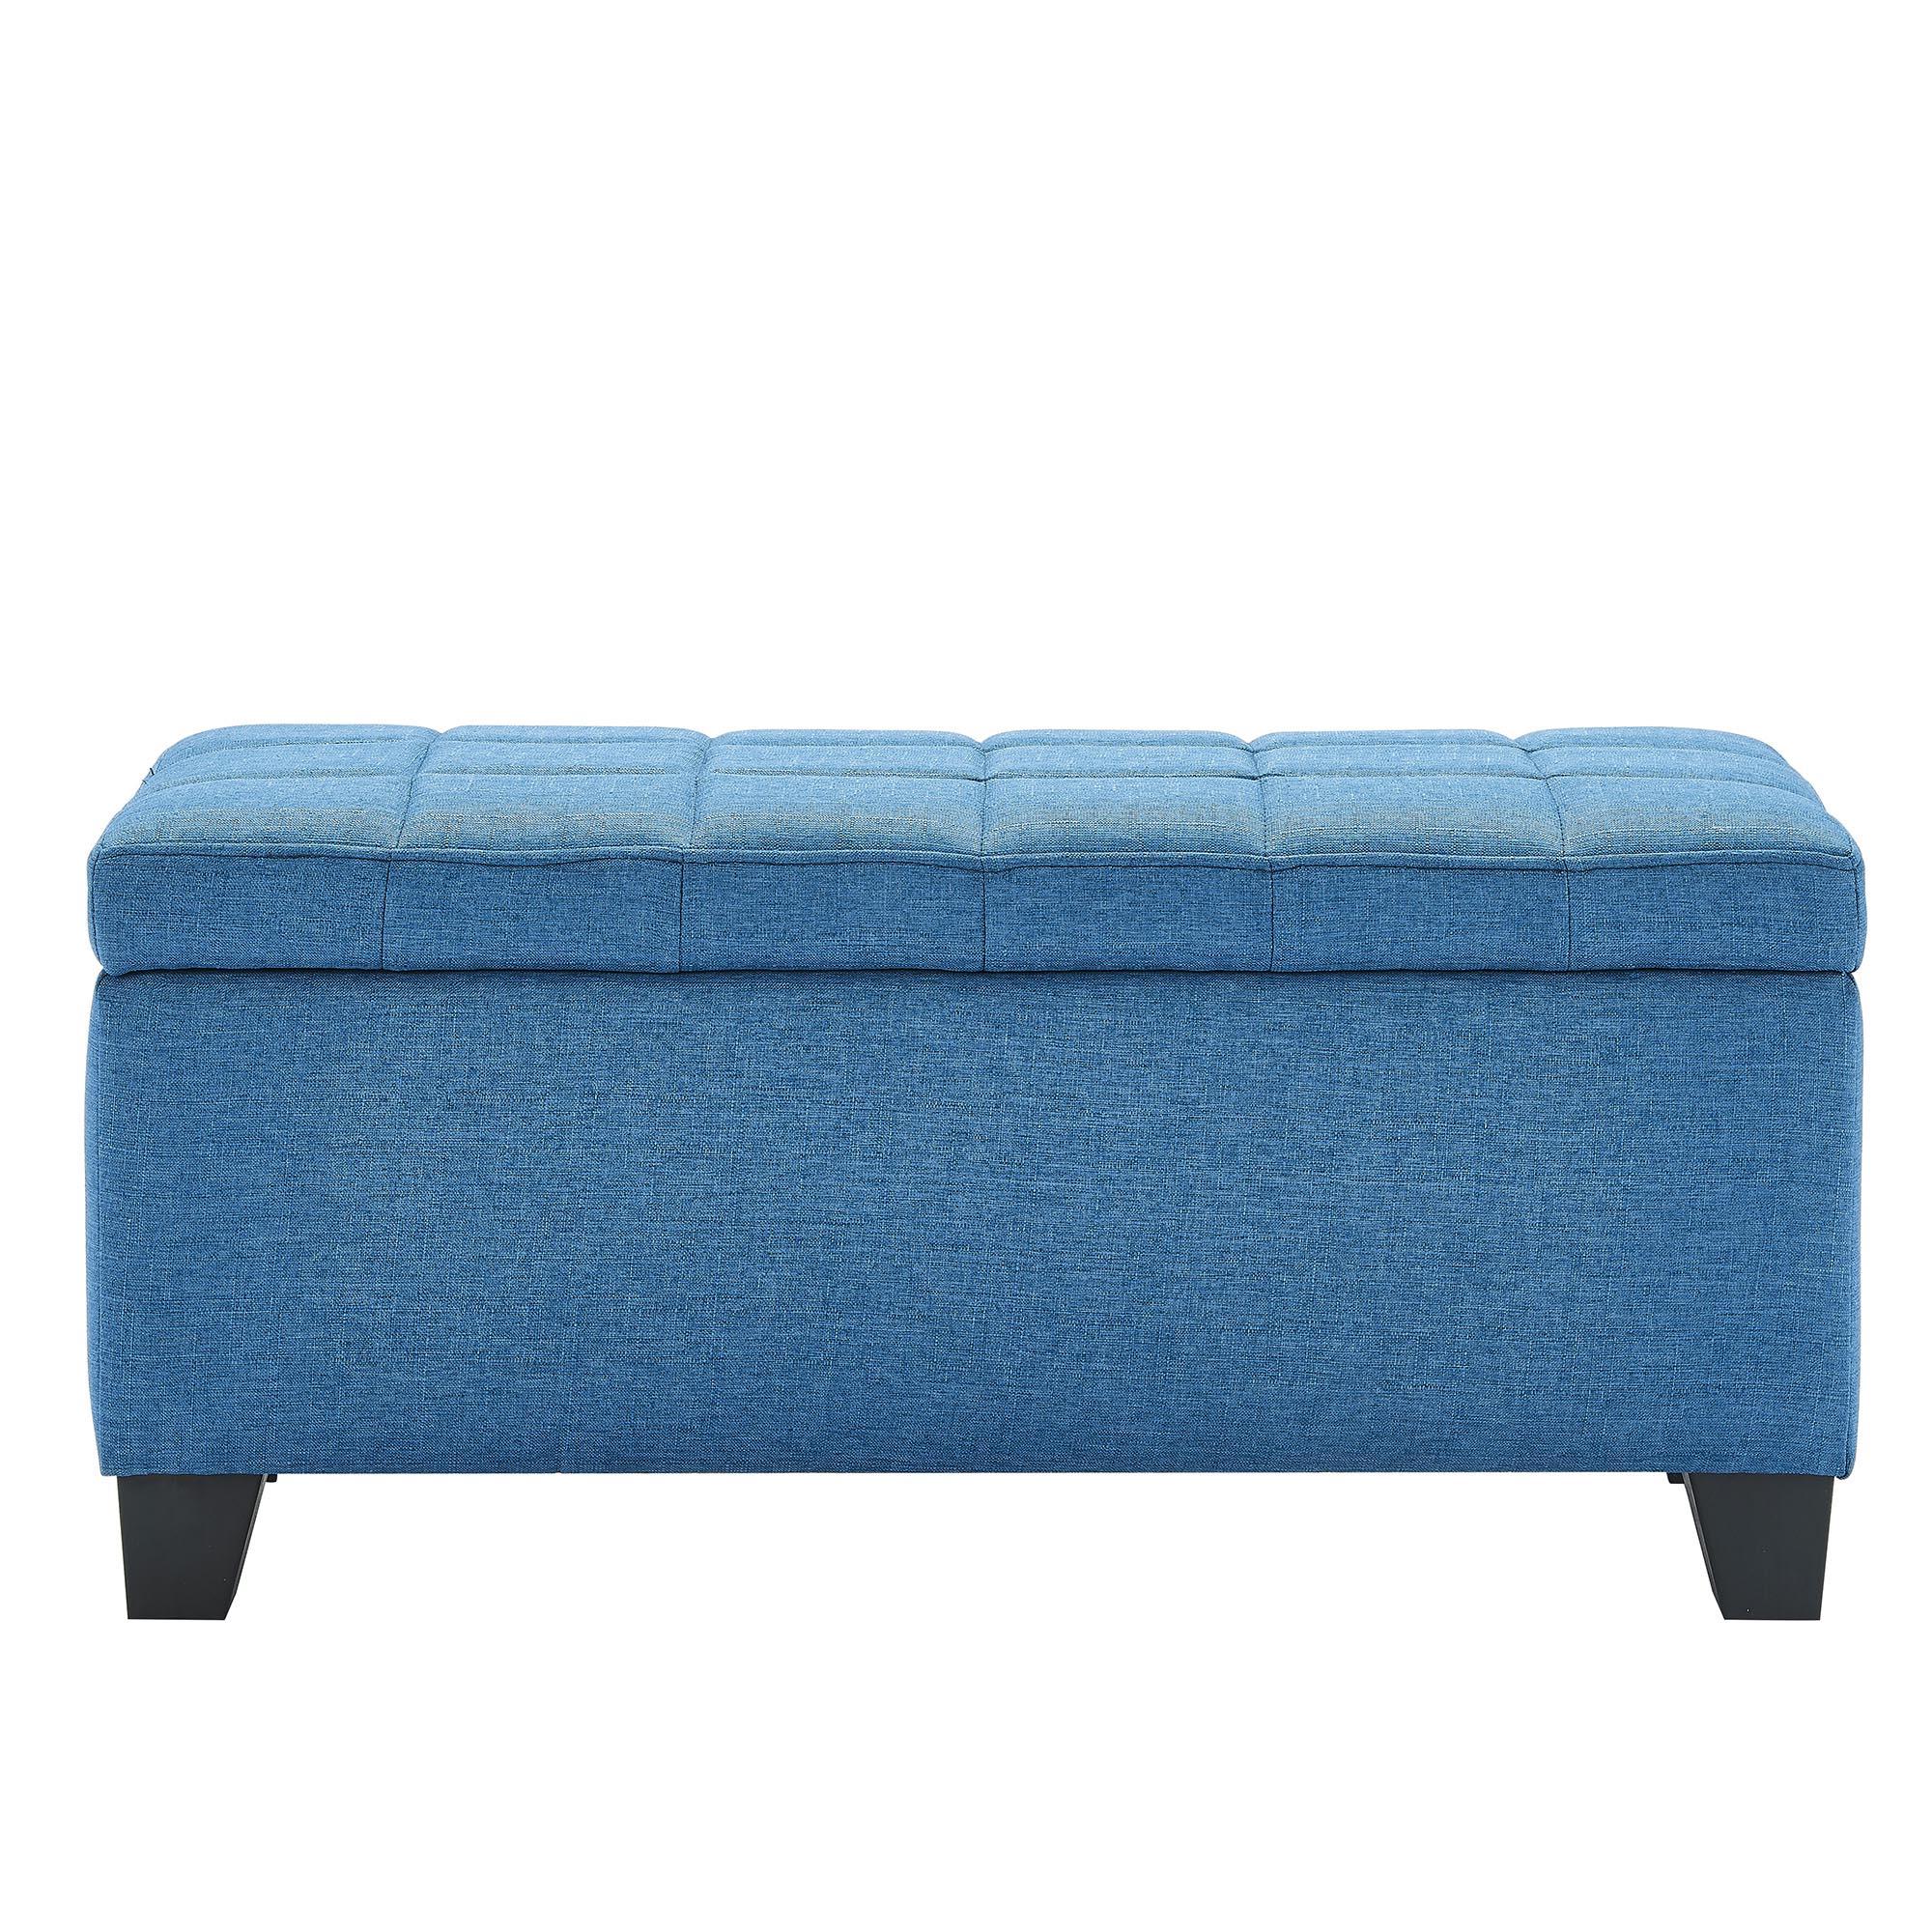 Modern Fabric Rectangular Storage Ottoman in Blue